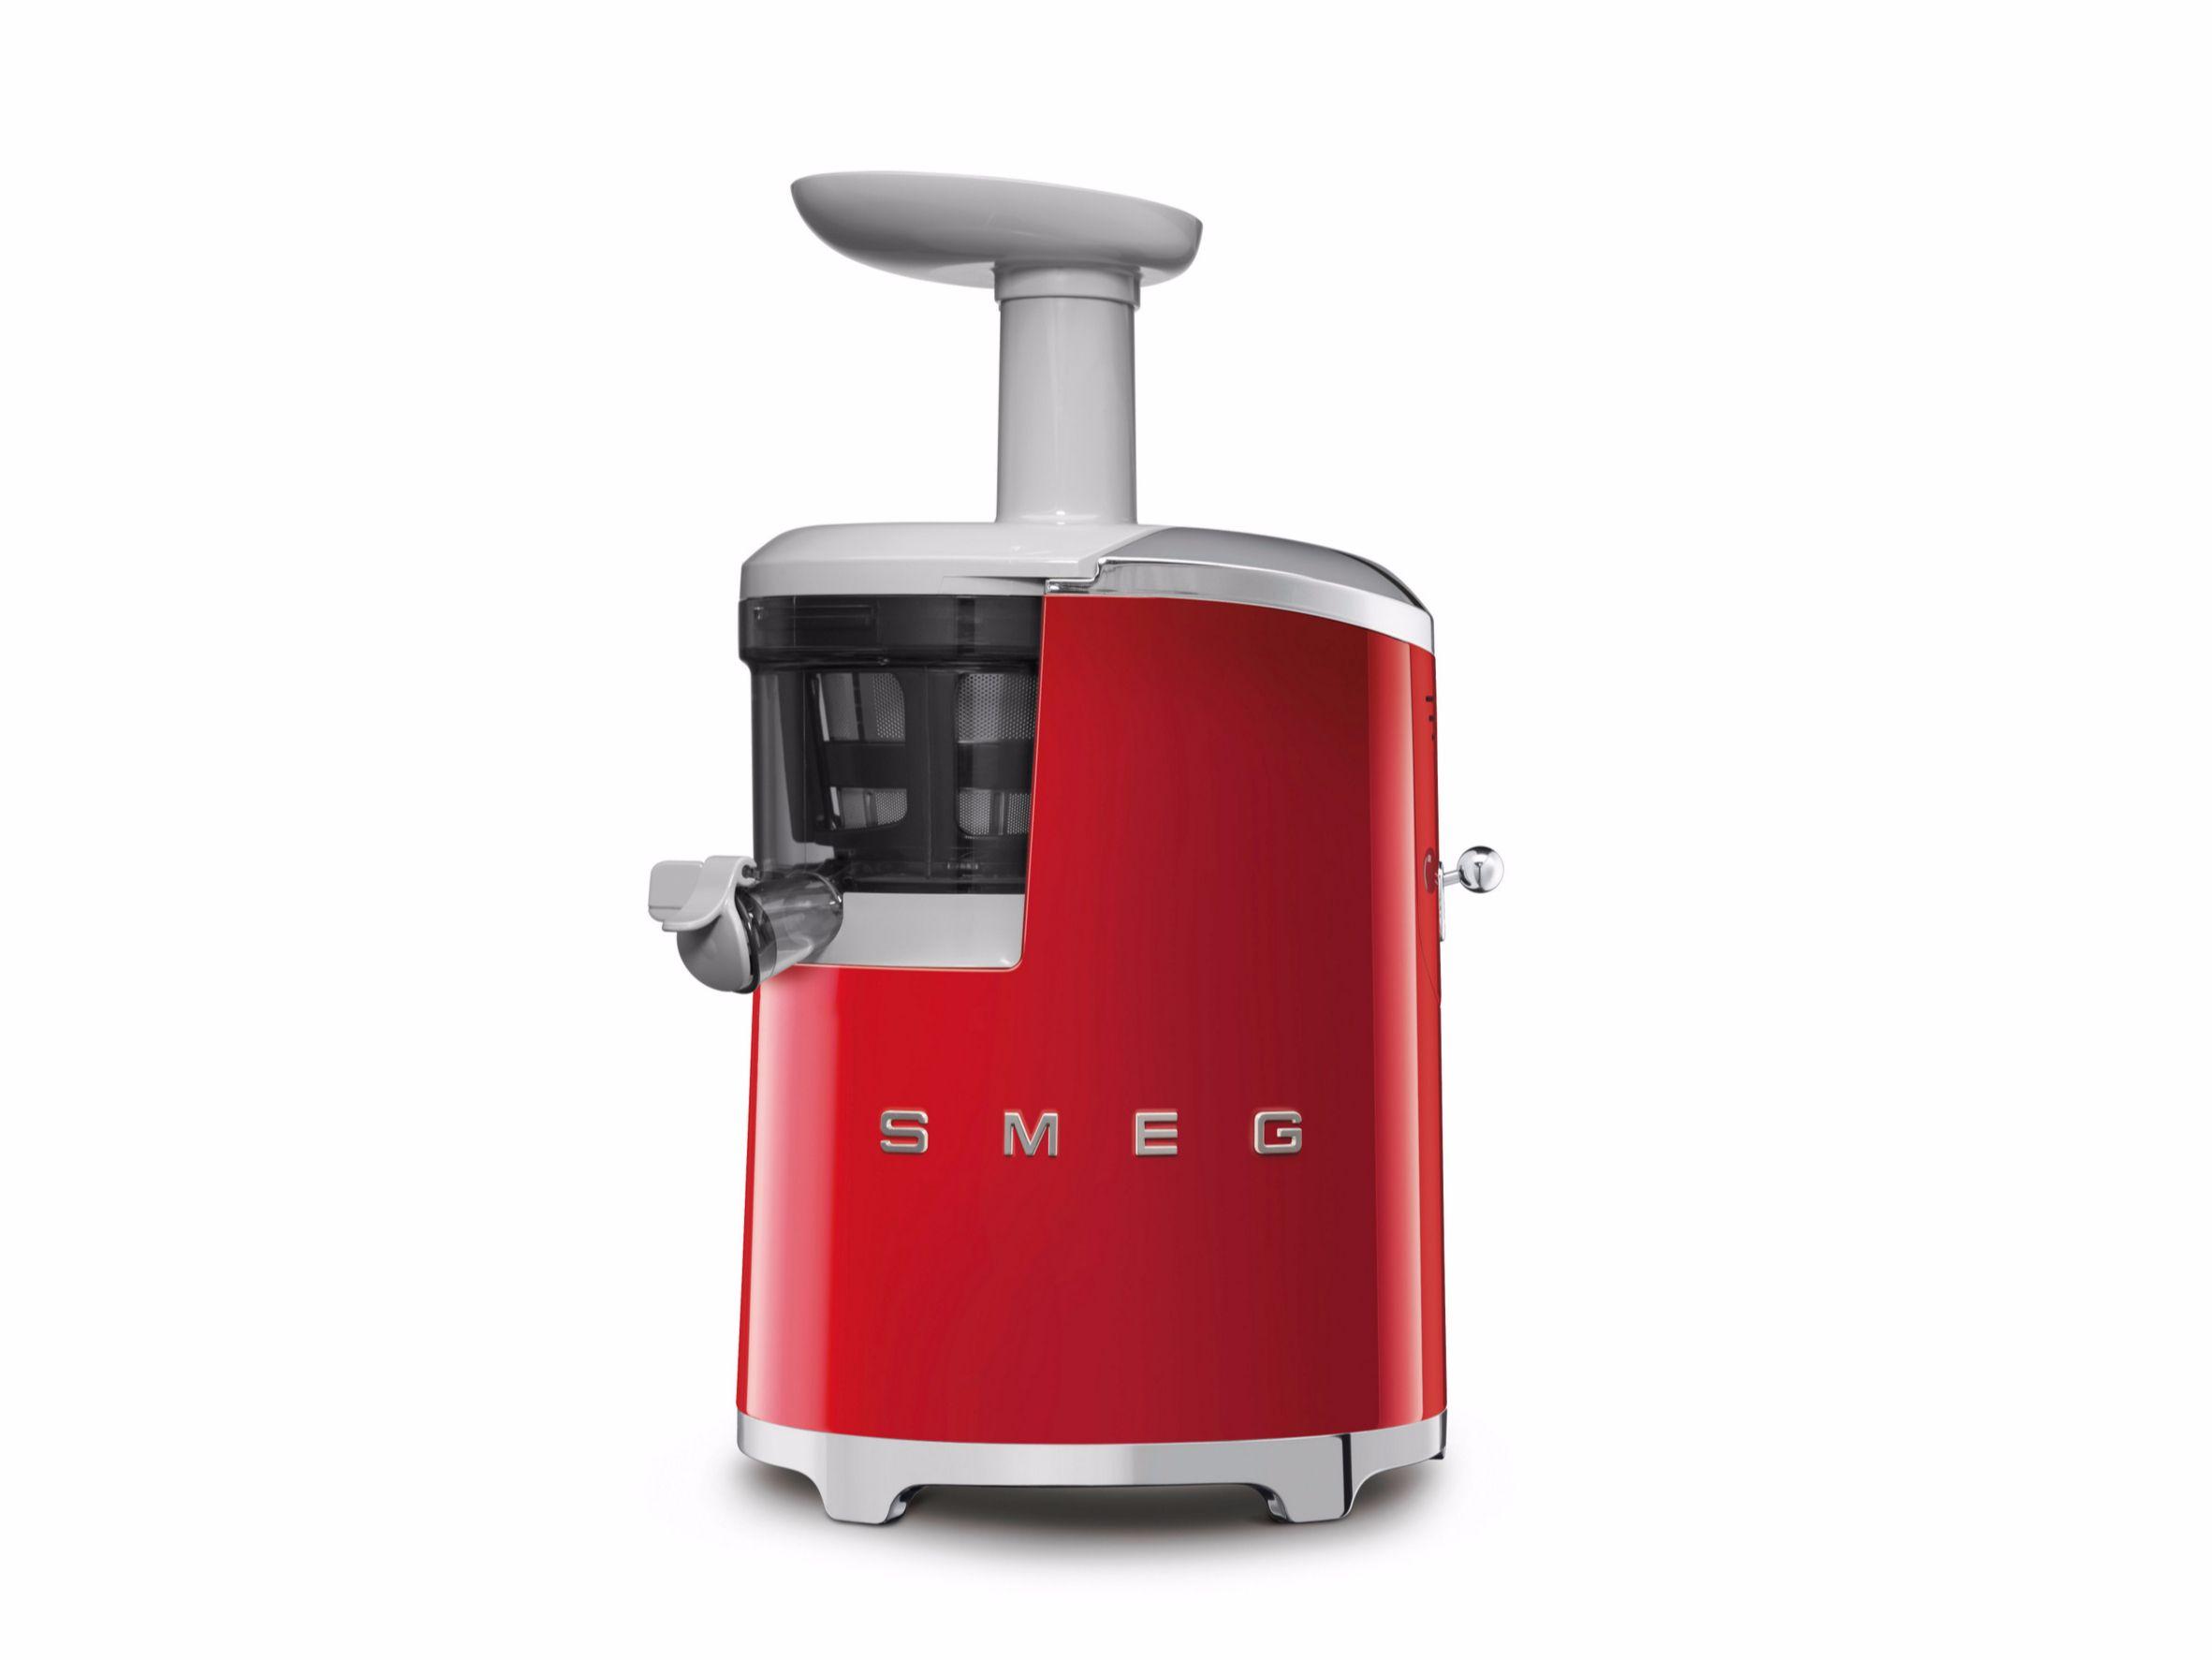 Blender sjf01 smeg 50 39 s style collection by smeg - Smeg productos ...